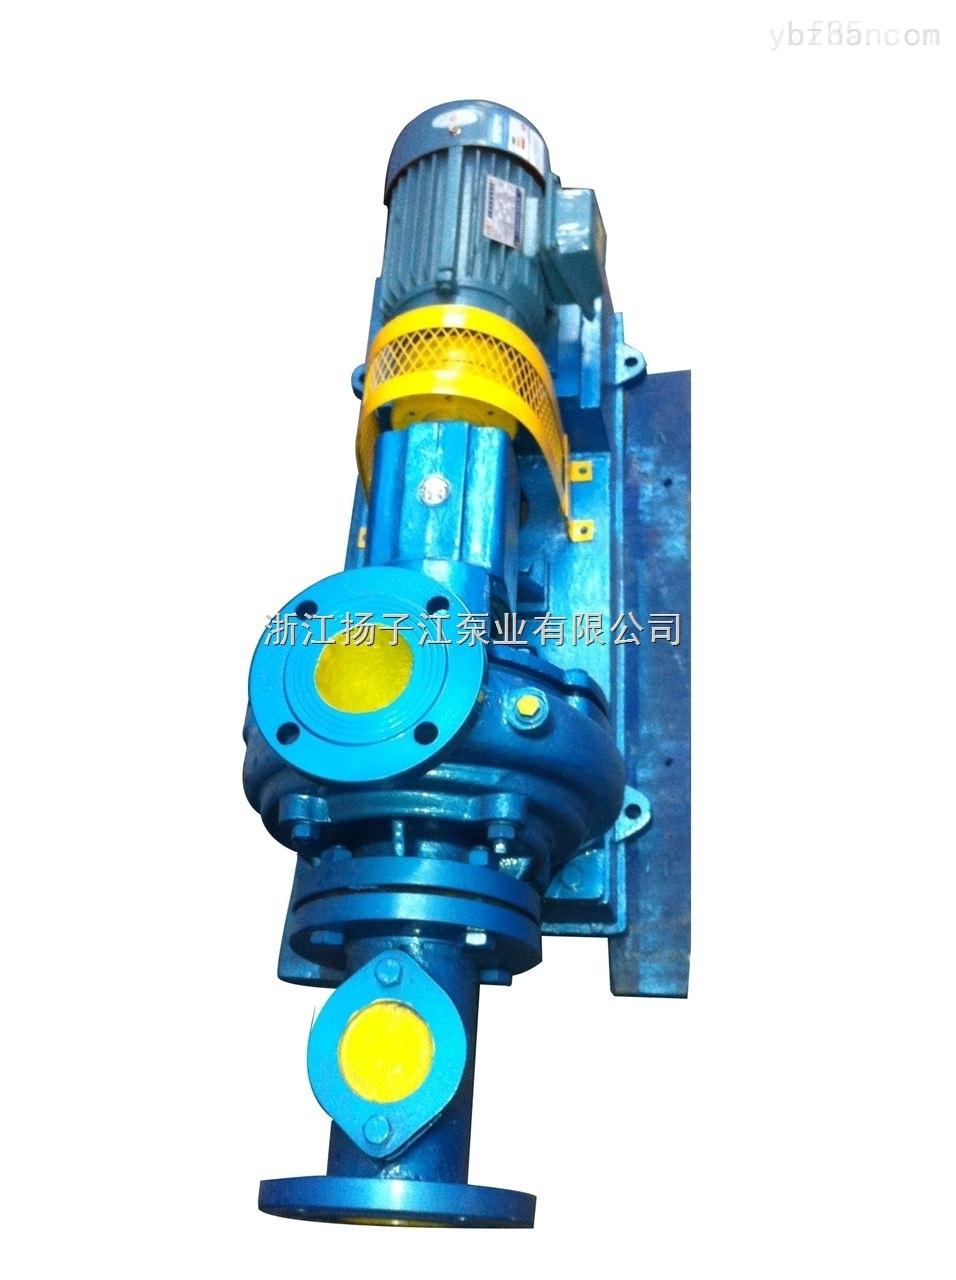 WXJ纸浆泵 无堵塞纸浆泵 不锈钢纸浆泵 80XWJ25-12.5